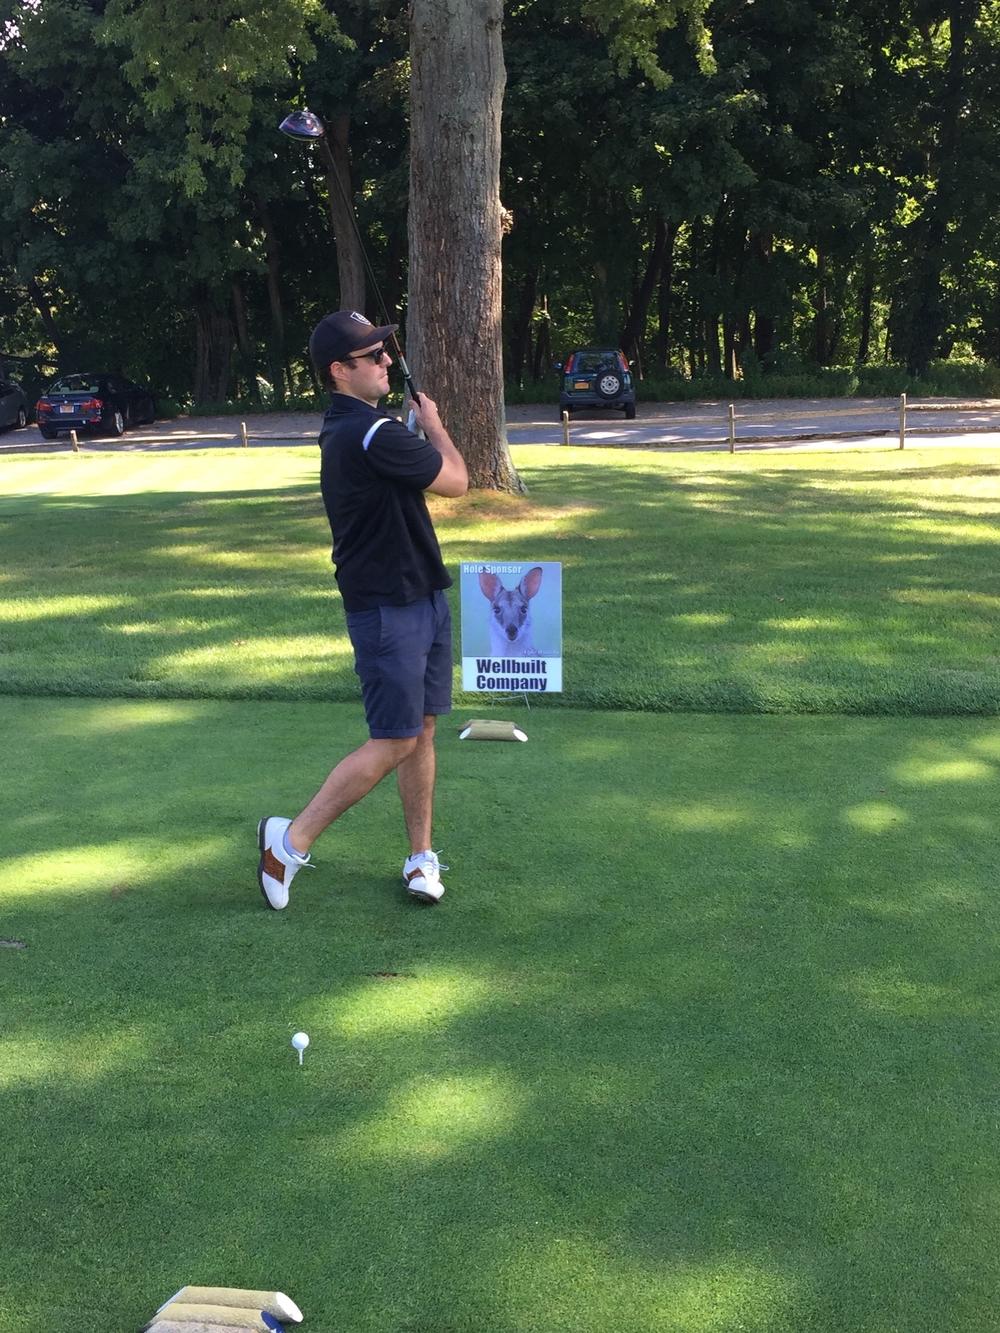 wellbuilt golf outing.JPG